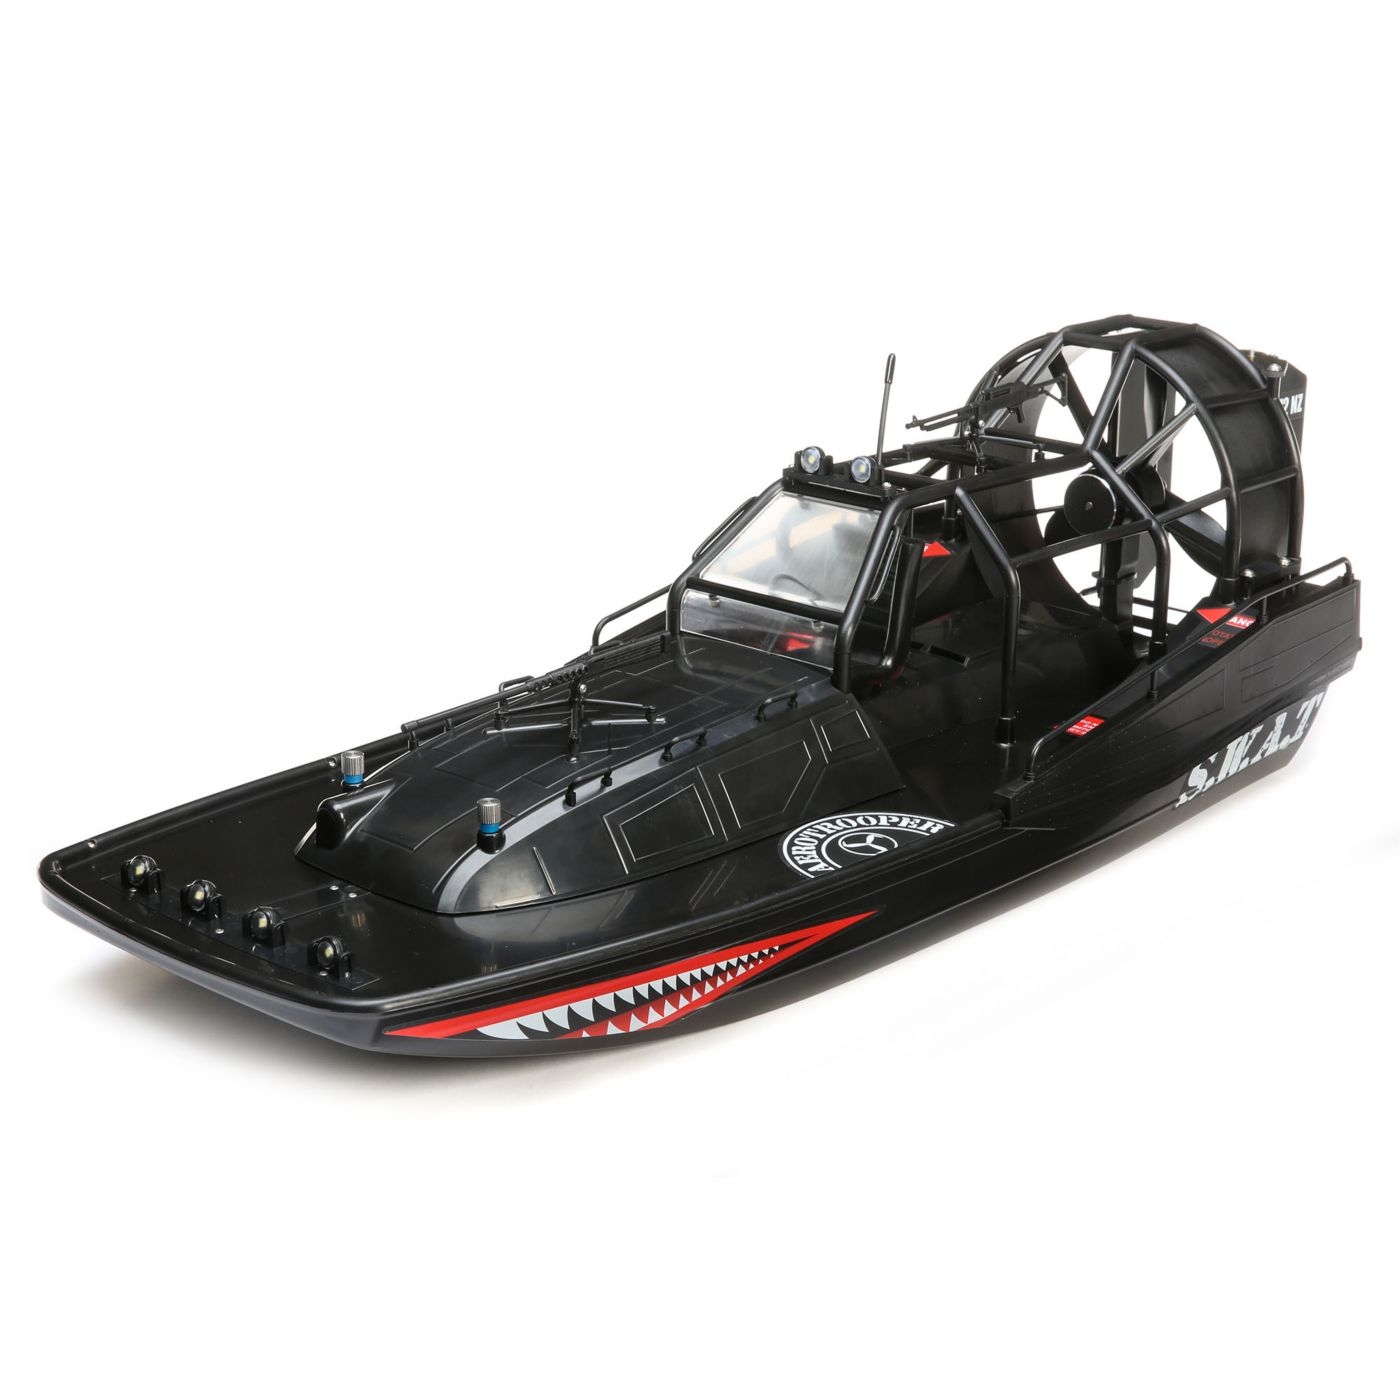 Pro Boat PRB Aluminum Accessories PRB286044 48 Zelos G Catamaran US RTR Horizon Hobby